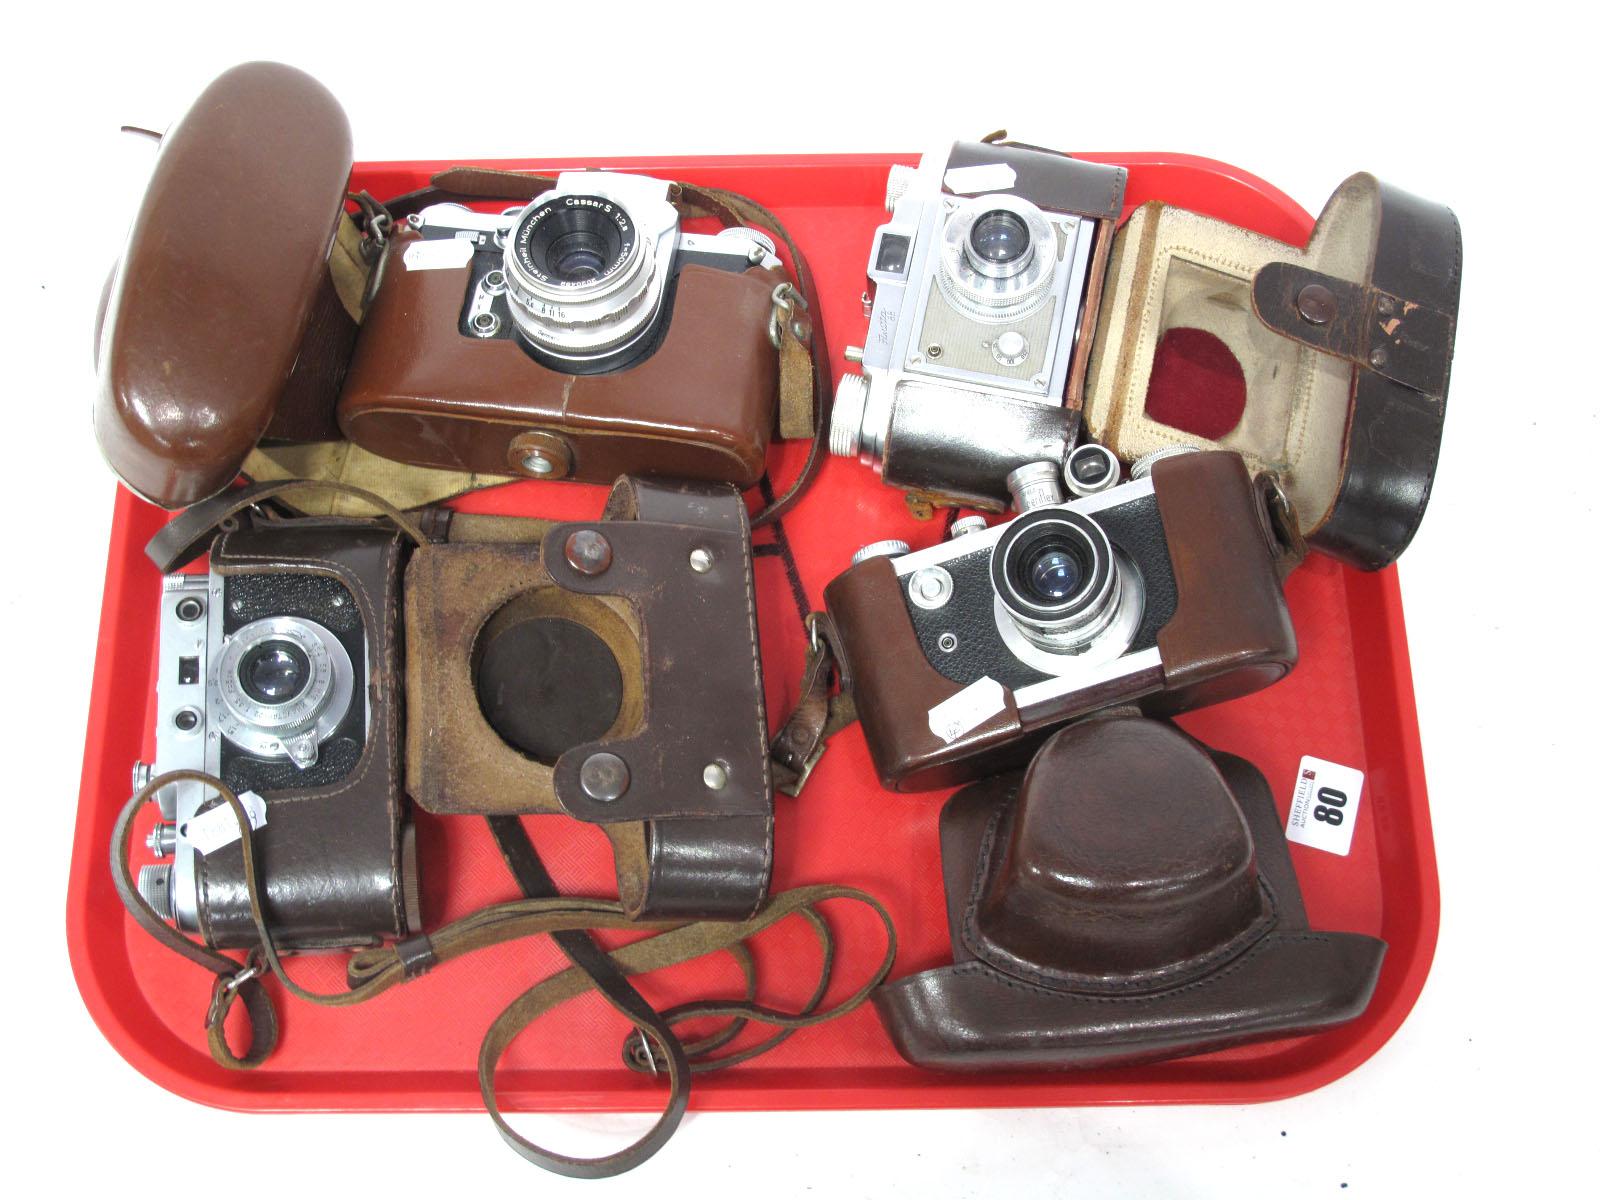 Saraber Goslar Finetta 88, Edika Flex, plus two other camera's in brown leather cases. (4)